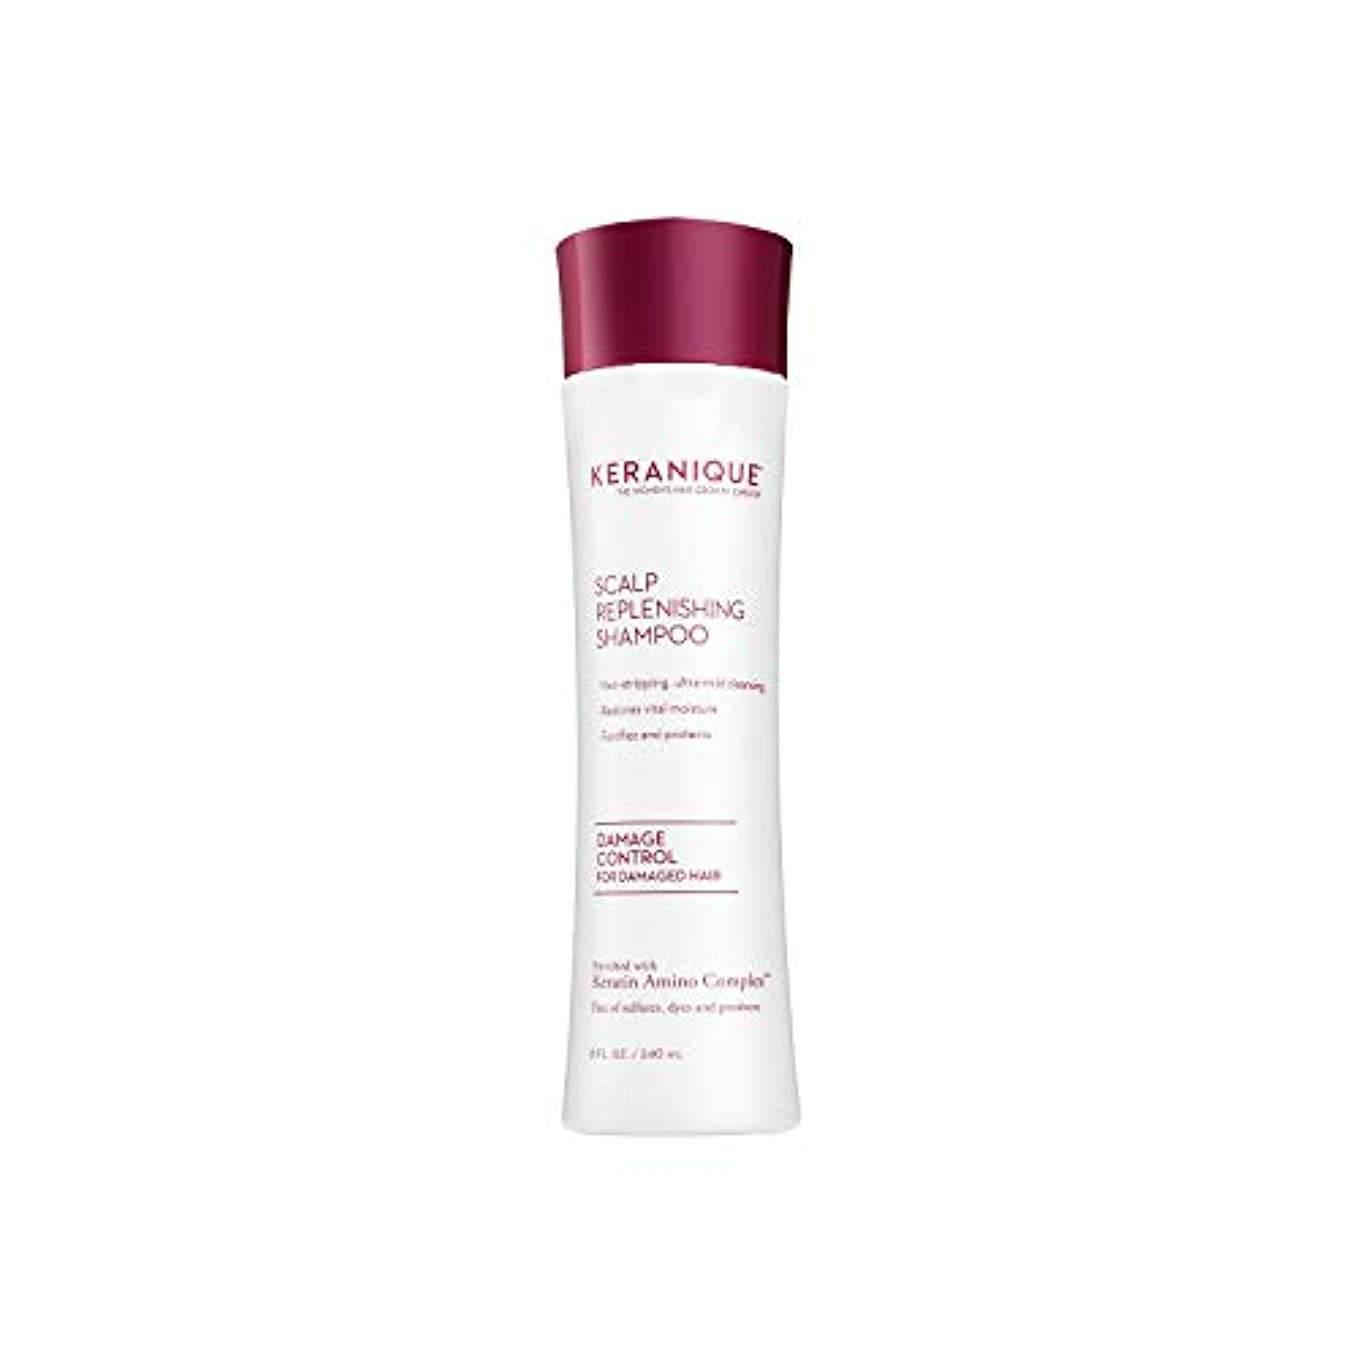 Keraniqueダメージコントロール頭皮補充シャンプー、8液量オンス - ケラチンアミノコンプレックス、硫酸塩、染料、パラベンフリー - ノンストリッピング、強化および保護 - 将来の損傷した髪と修理を防止